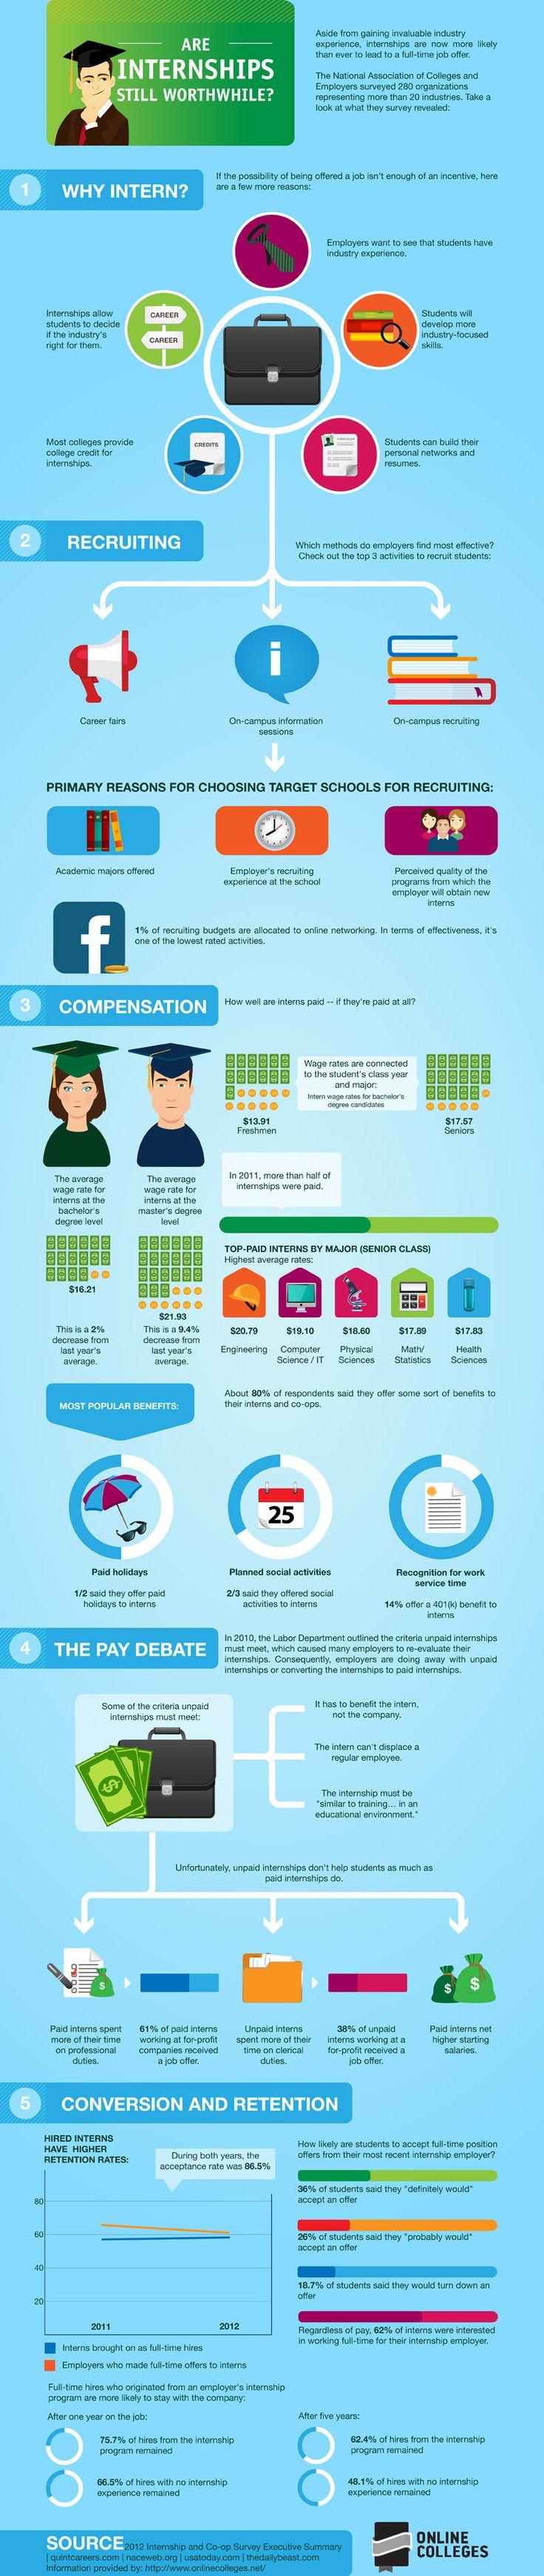 59 best Internships images on Pinterest   Career advice, College ...